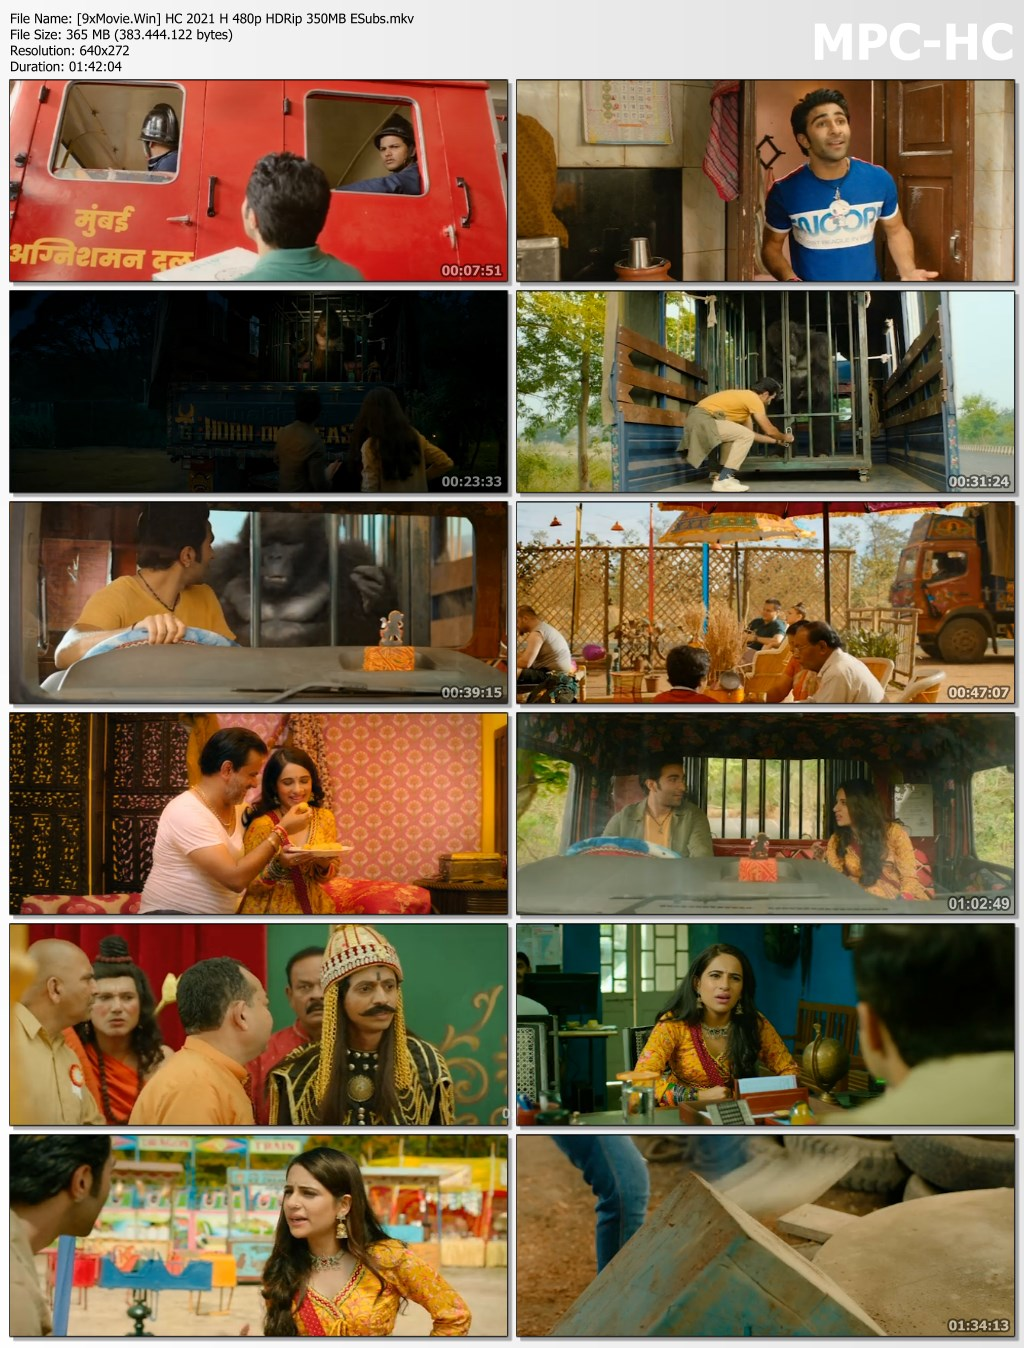 Hello Charlie 2021 Bollywood Movie 480p HDRip x264 350MB ESubs